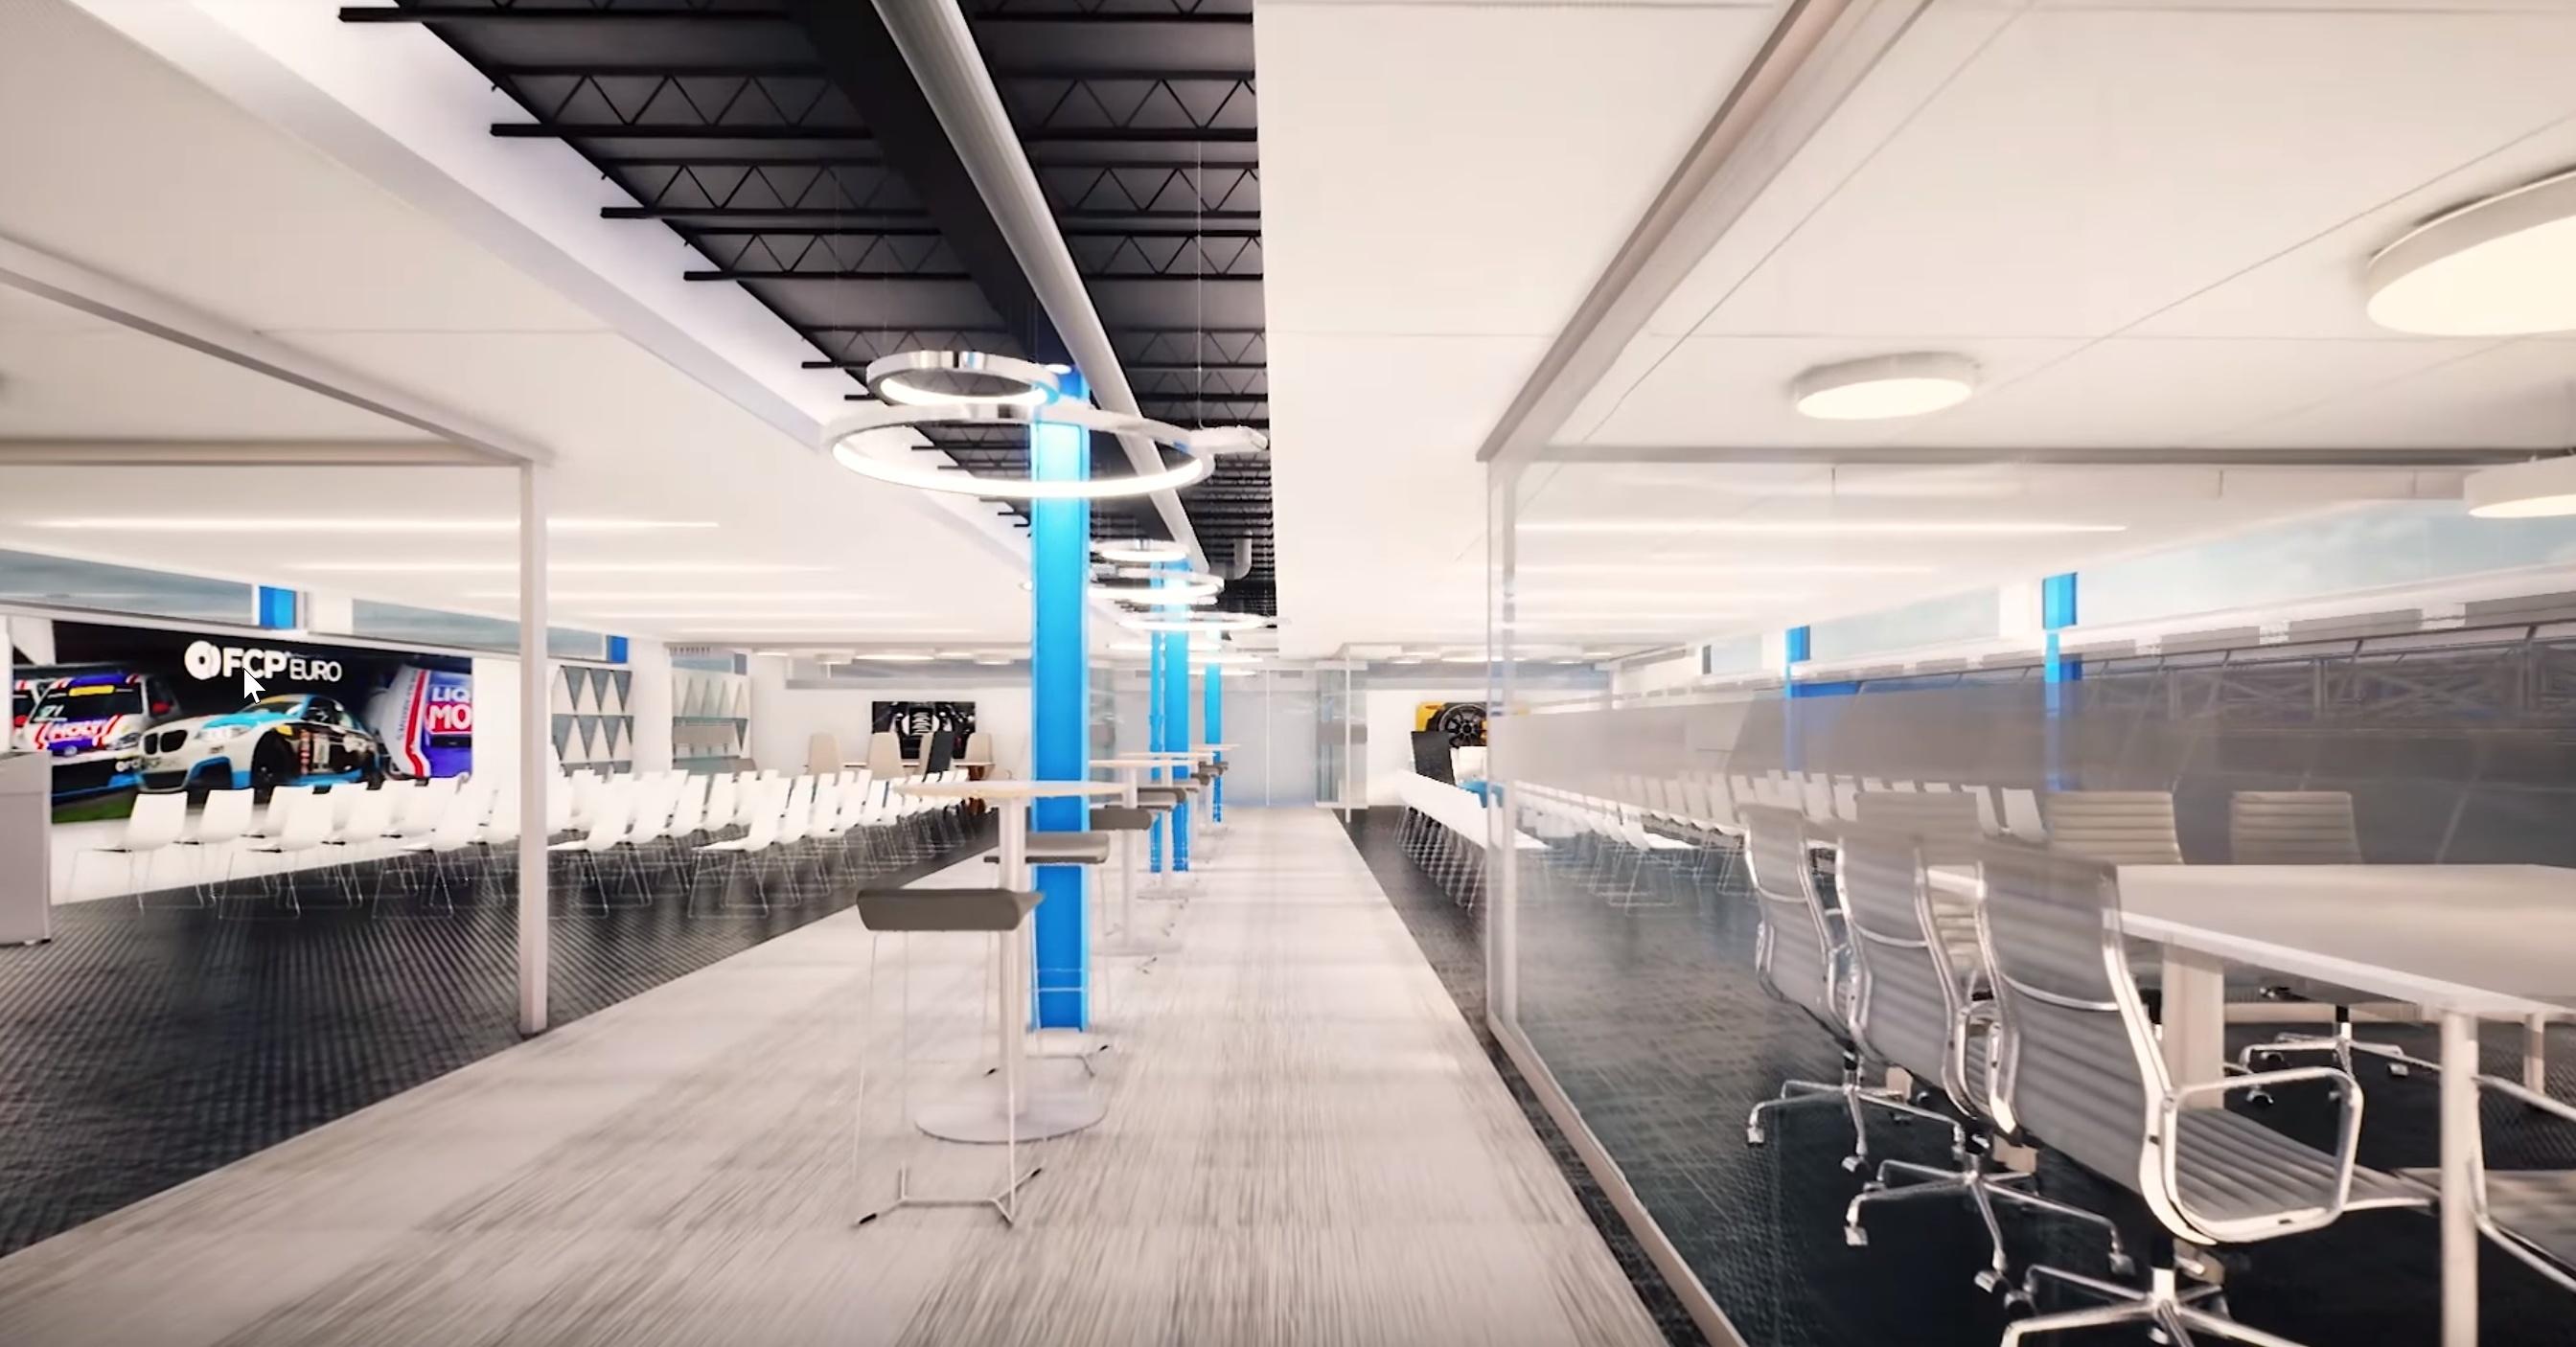 fcp-euro-expansion-mezzanine-offices-2